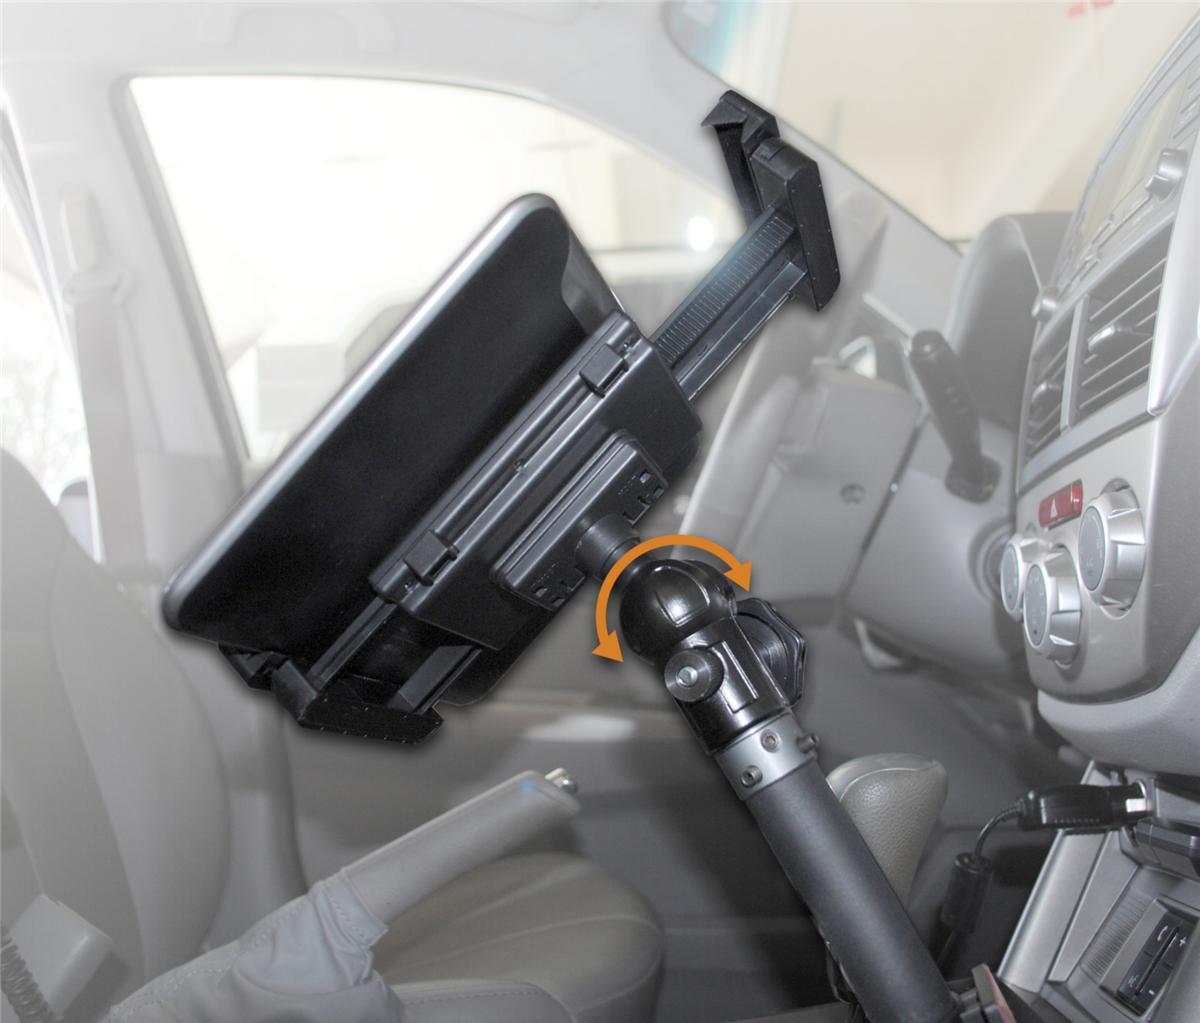 Car Seatbolt Tablet Smartphone Mount Holder For Ipad Galaxy Kindle